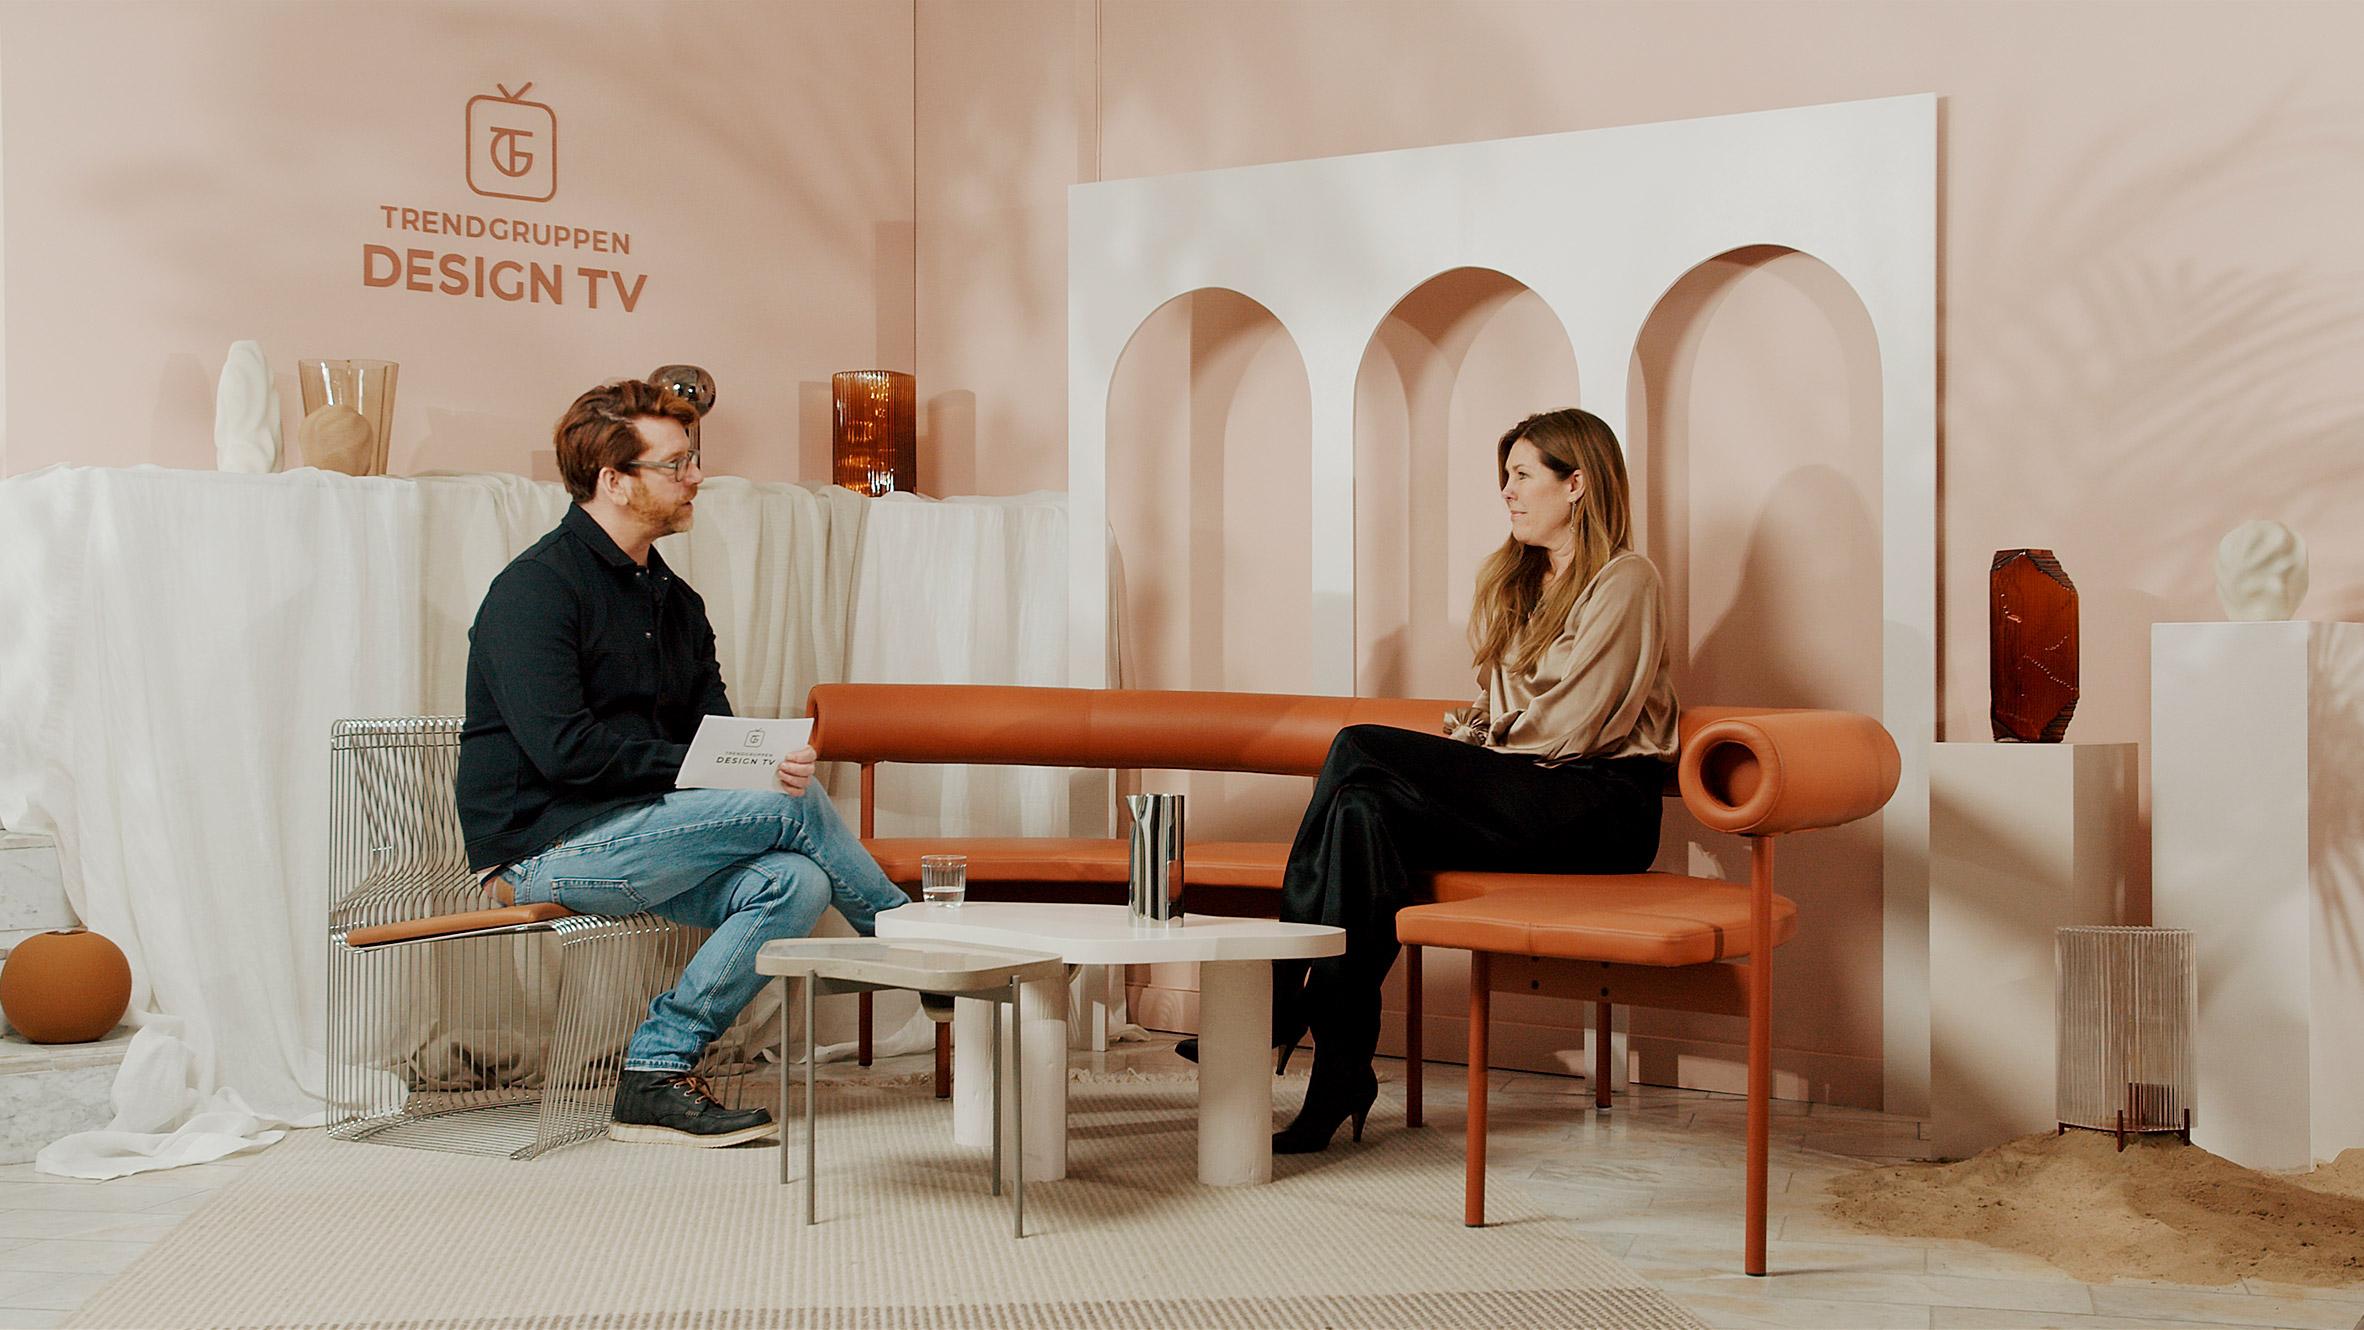 Karin Sköldberg is interviewed by Stefan Nilsson